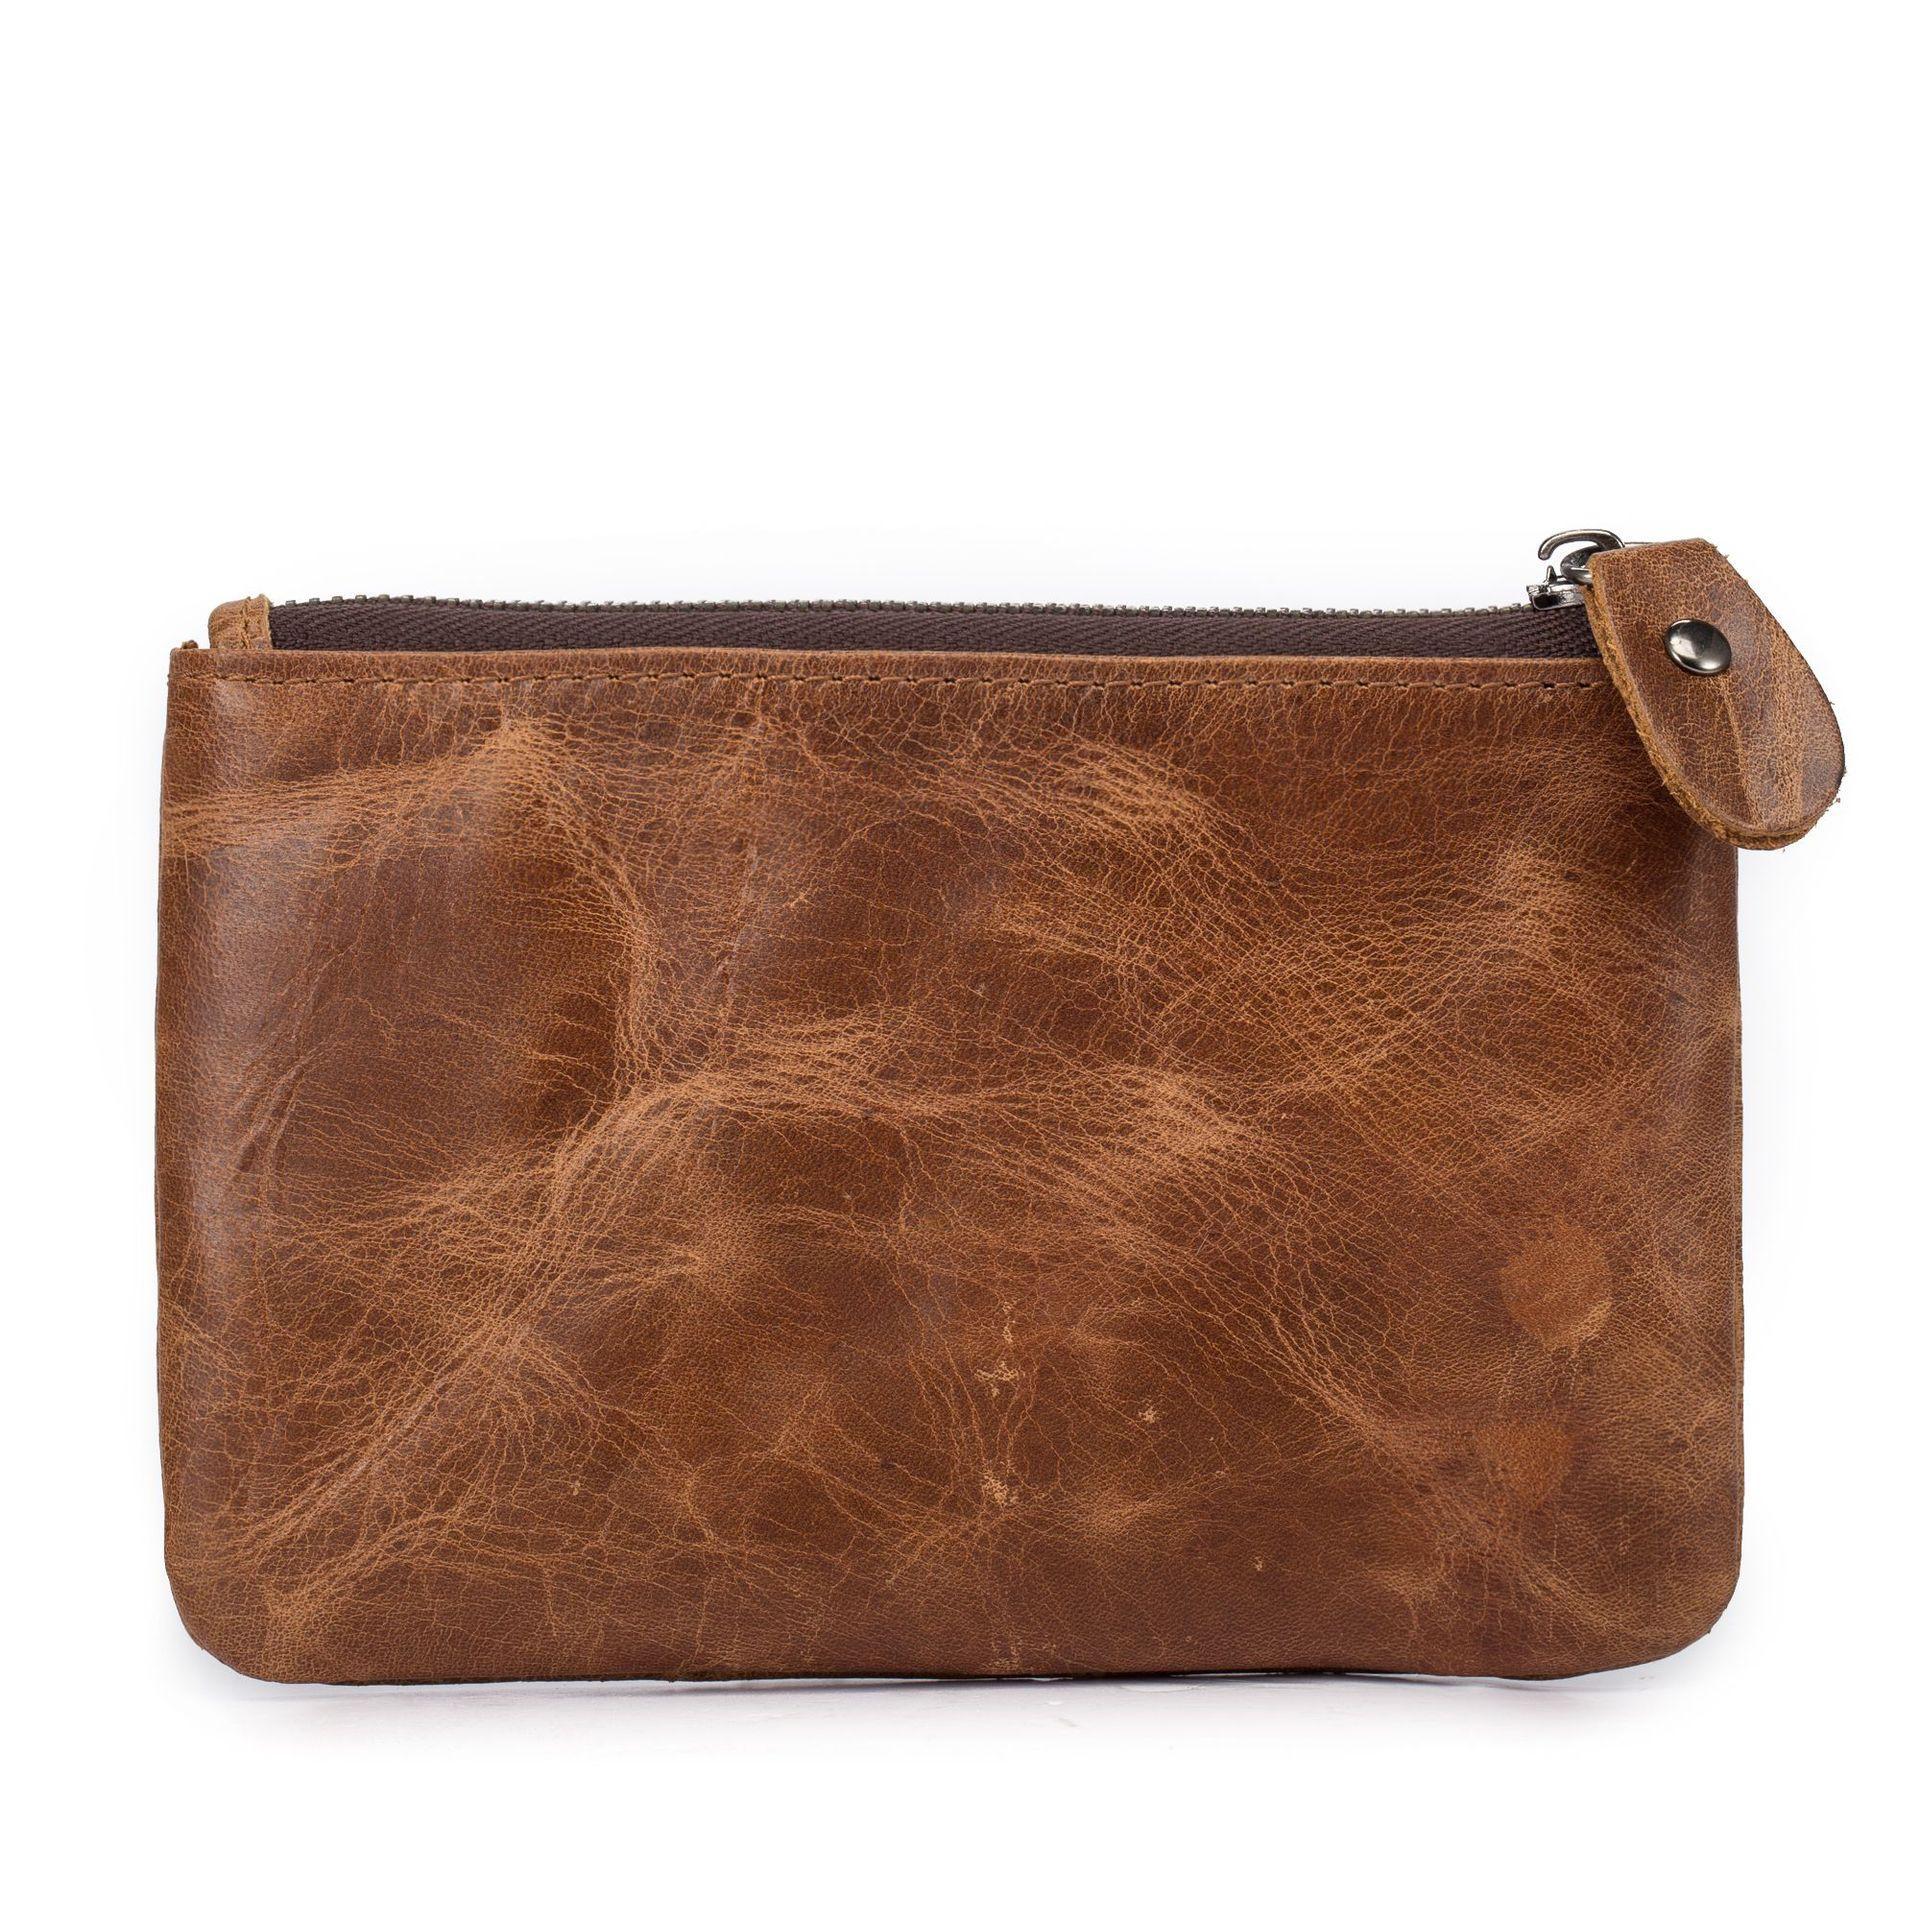 Suntech Mongolian MEN'S Coin Purse Genuine Leather Full-grain Leather Horse Leather Key Coin Bag Wallet Zipper 1015